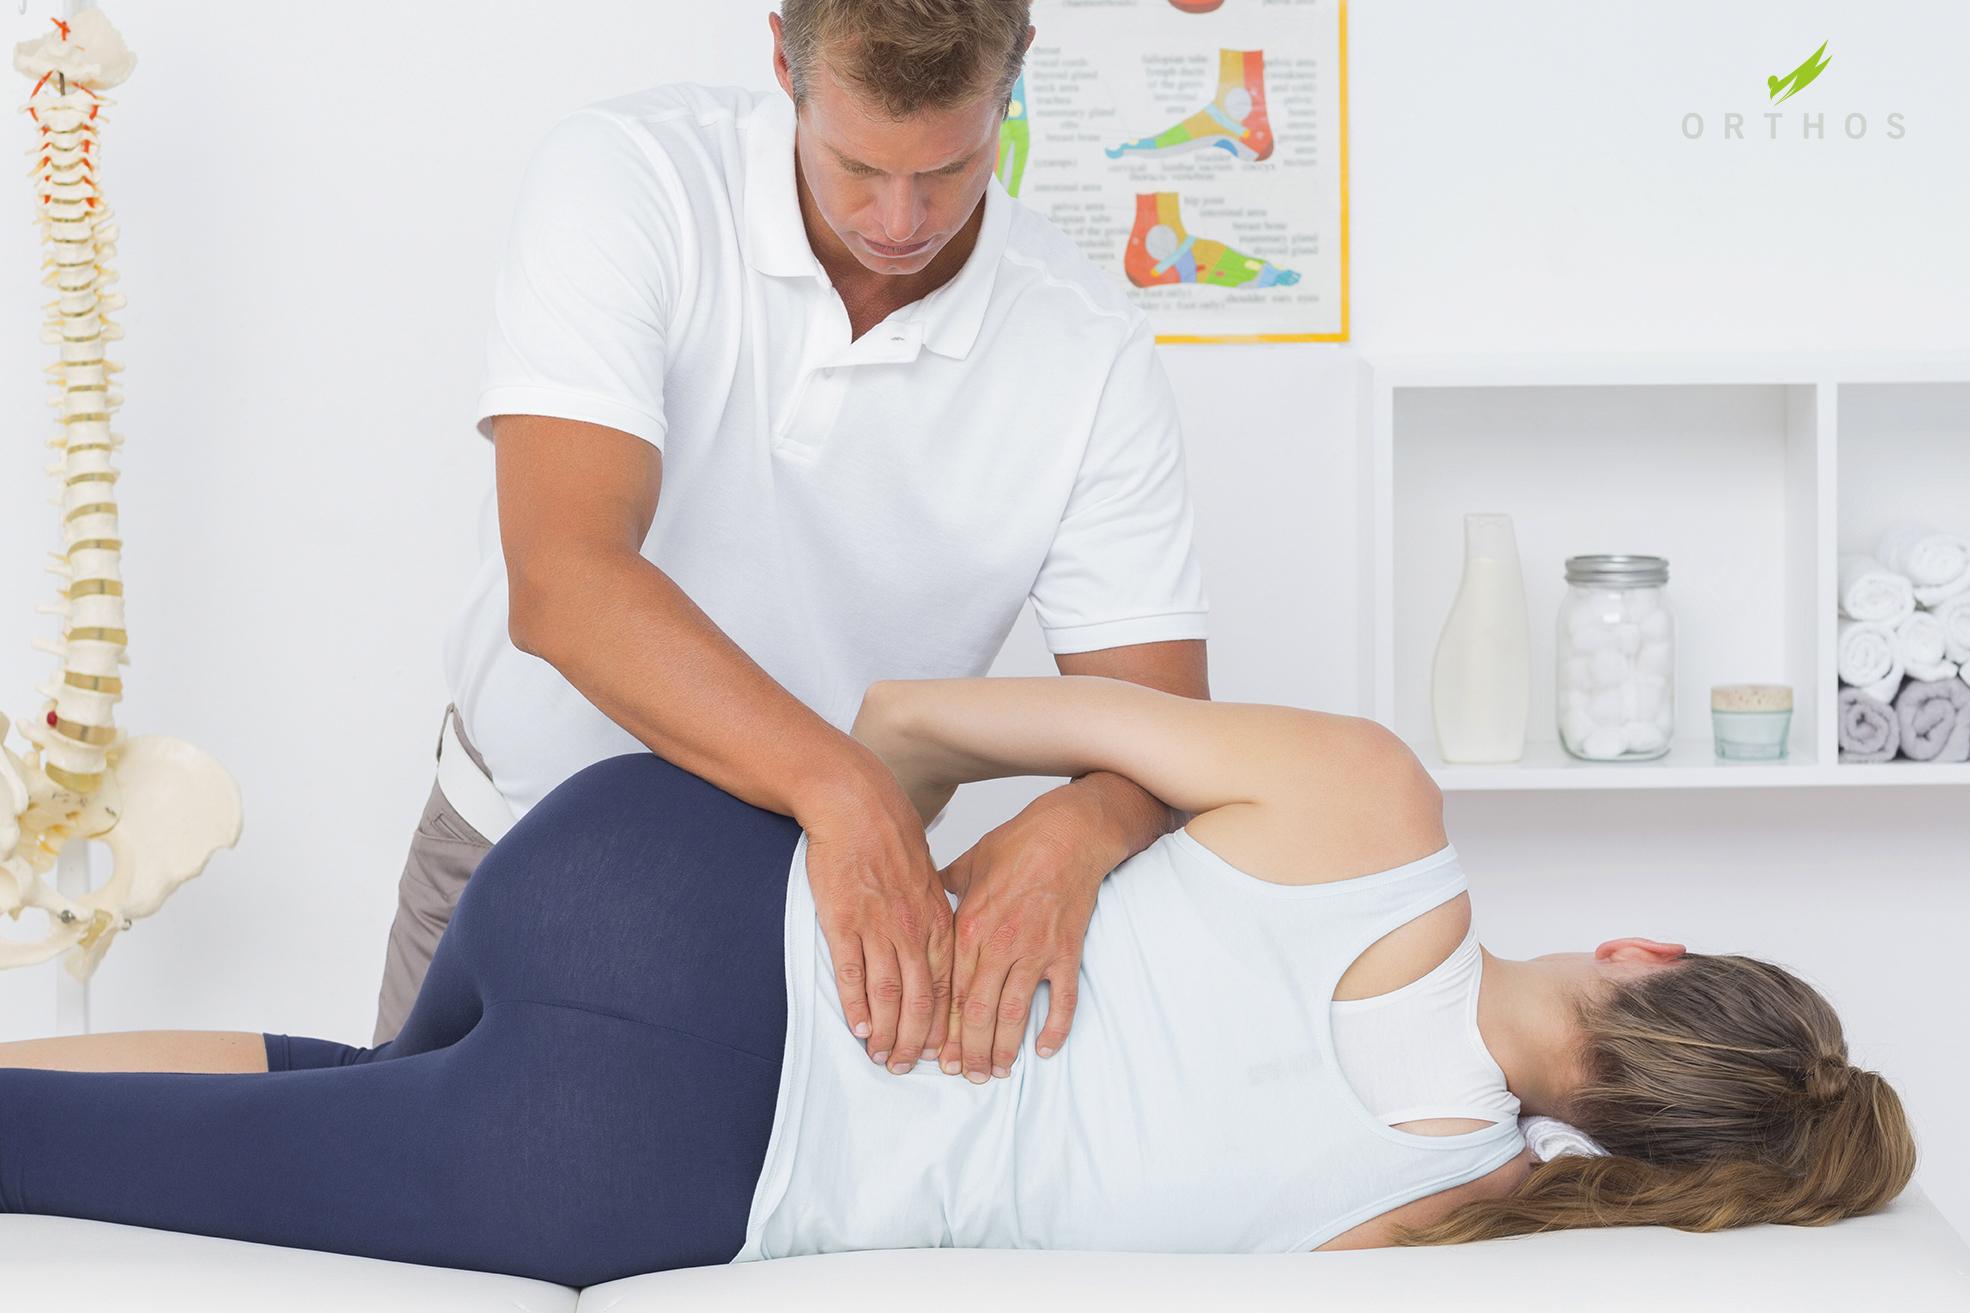 curso-quiromasaje-y-masaje deportivo-ORTHOS-intensivo verano-Santi Jacomet